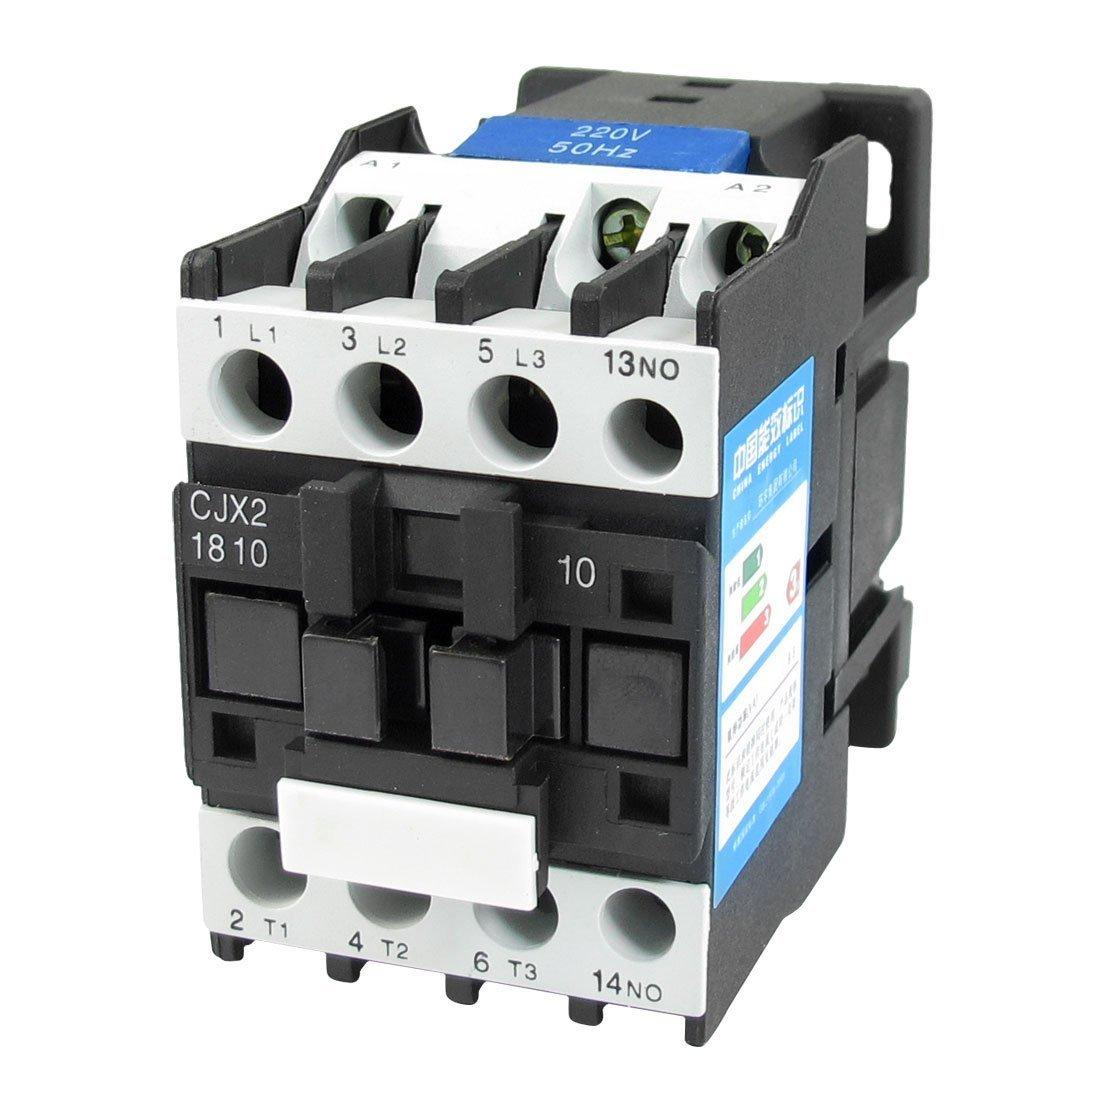 Baomain AC Contactor CJX2-1810 220V 50Hz 660V 32 Amp 3 Phase 3-Pole NO DIN rail